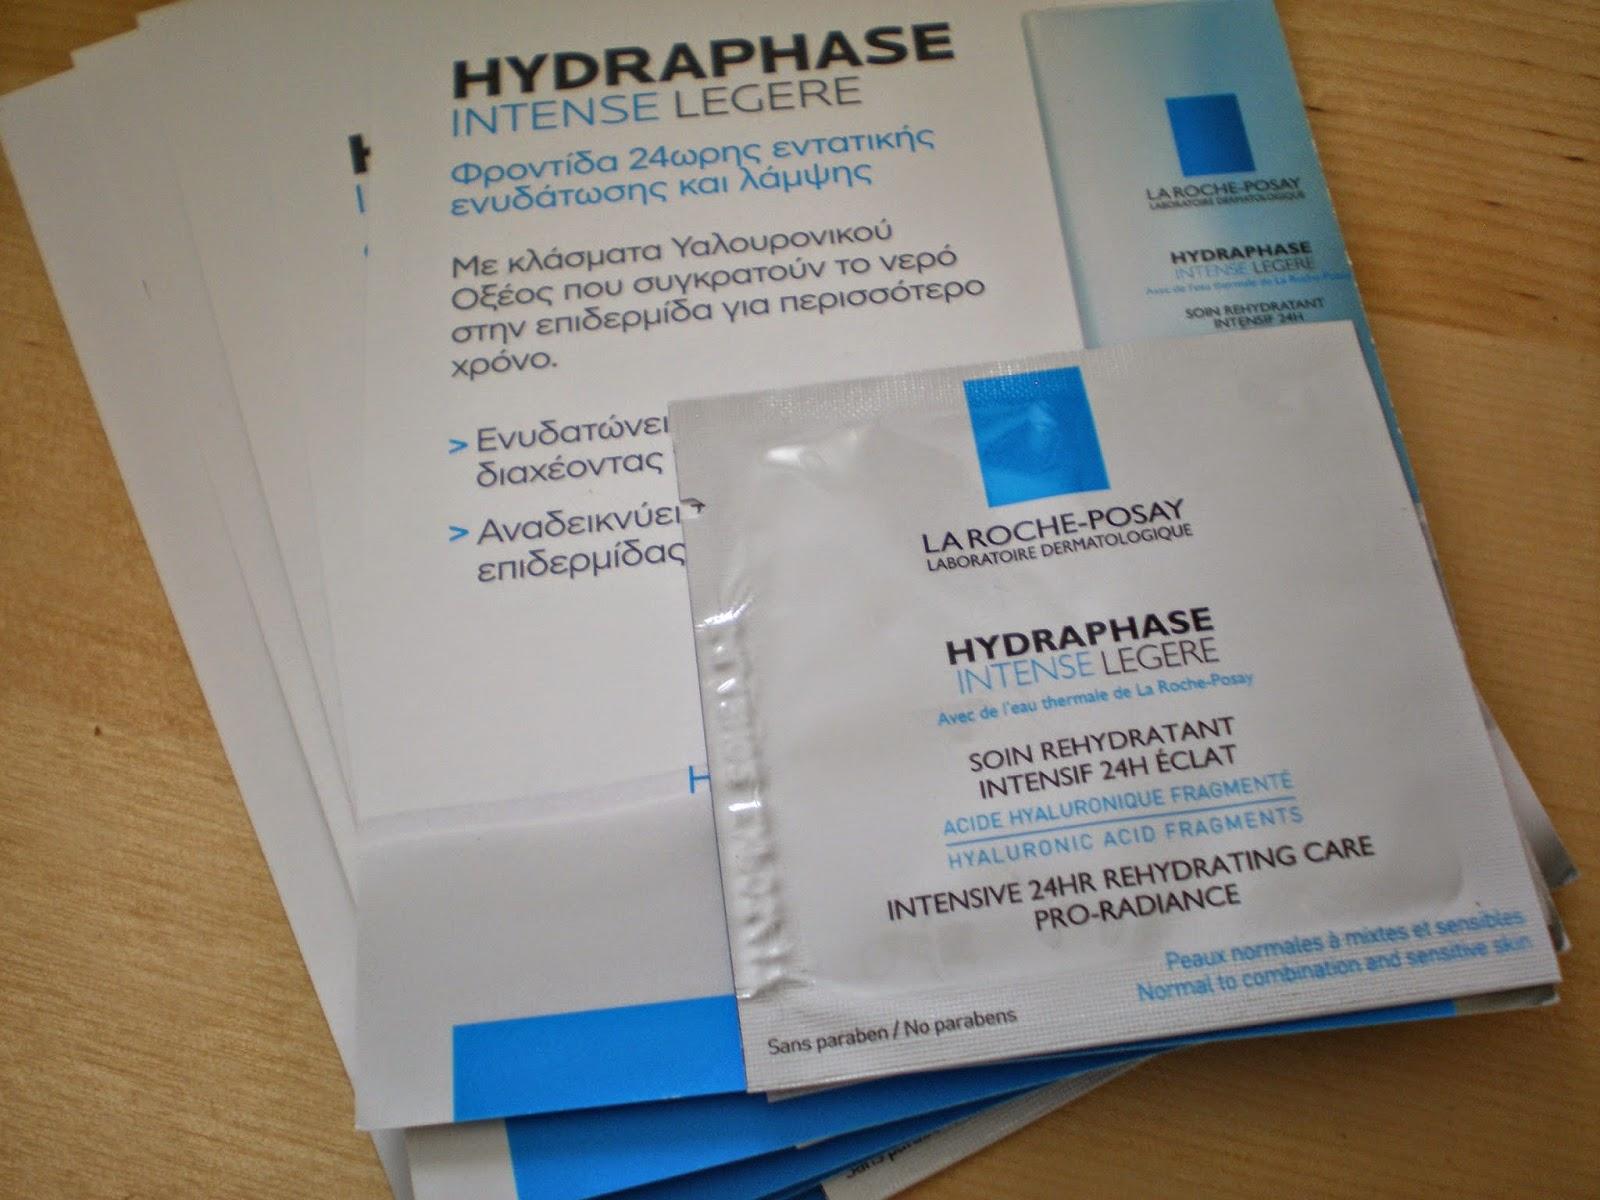 La Roche-Posay - Hydraphase Intense Legere